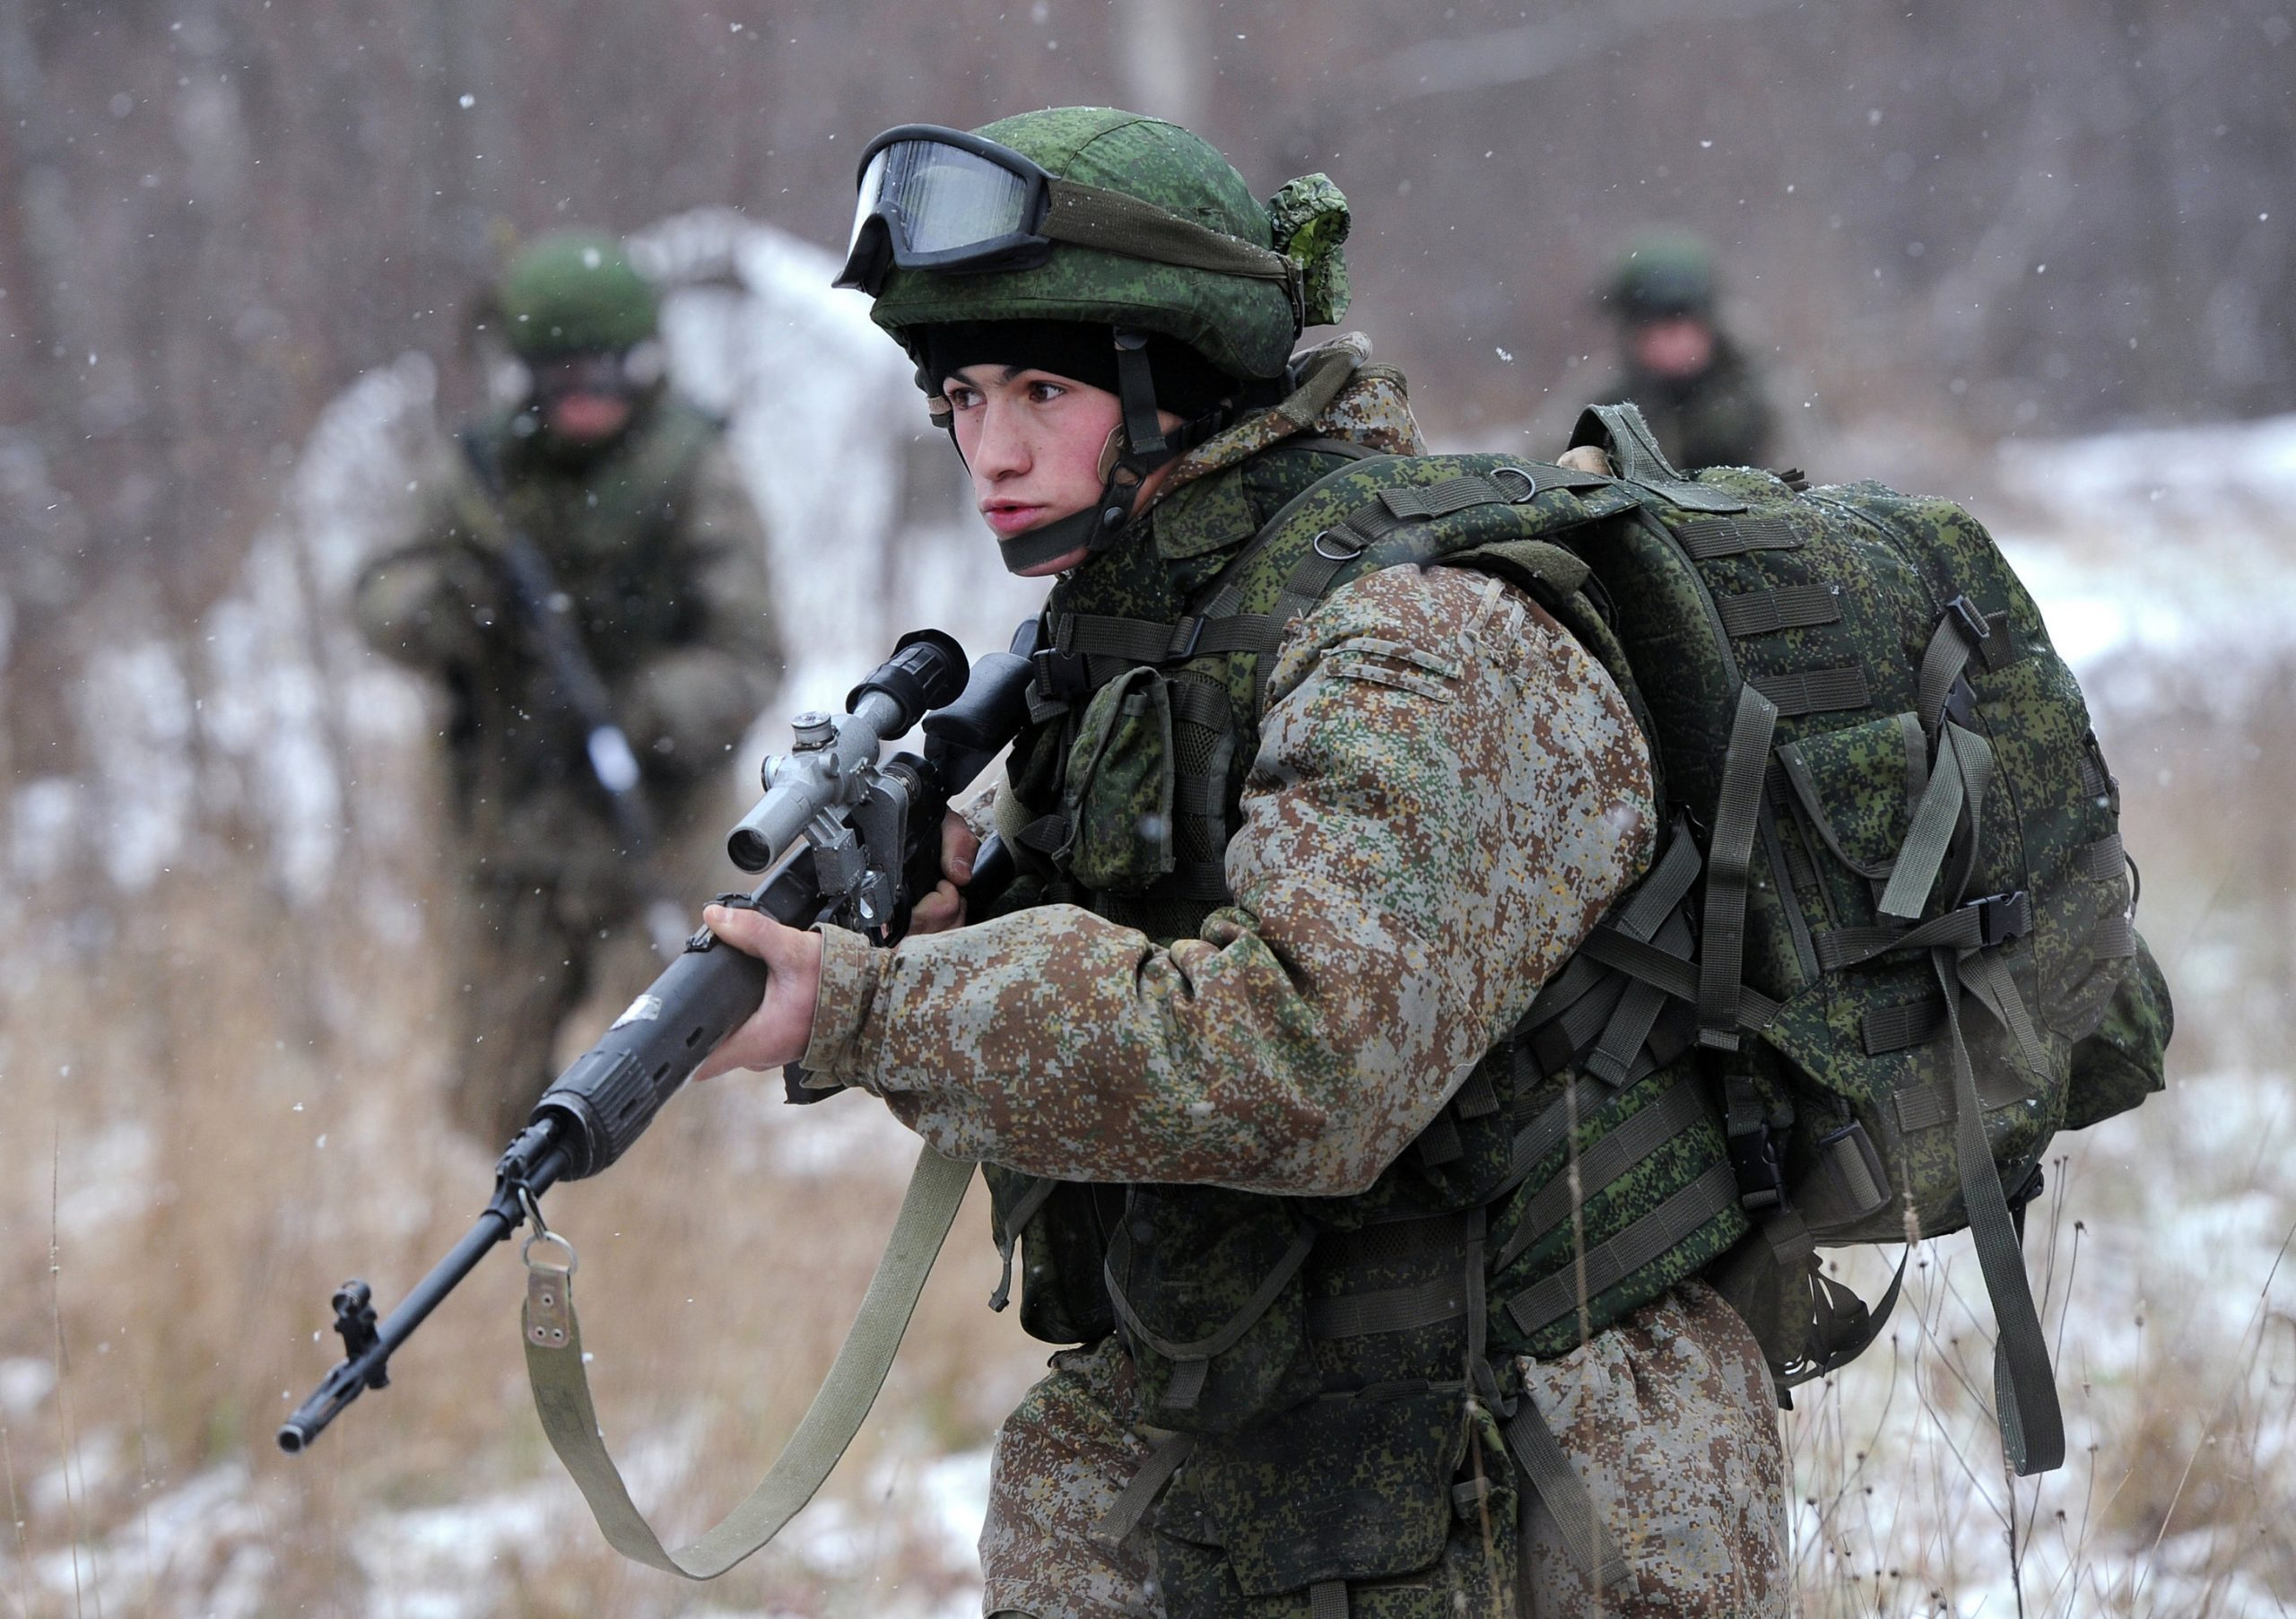 The Russian Army Ratnik combat helmet